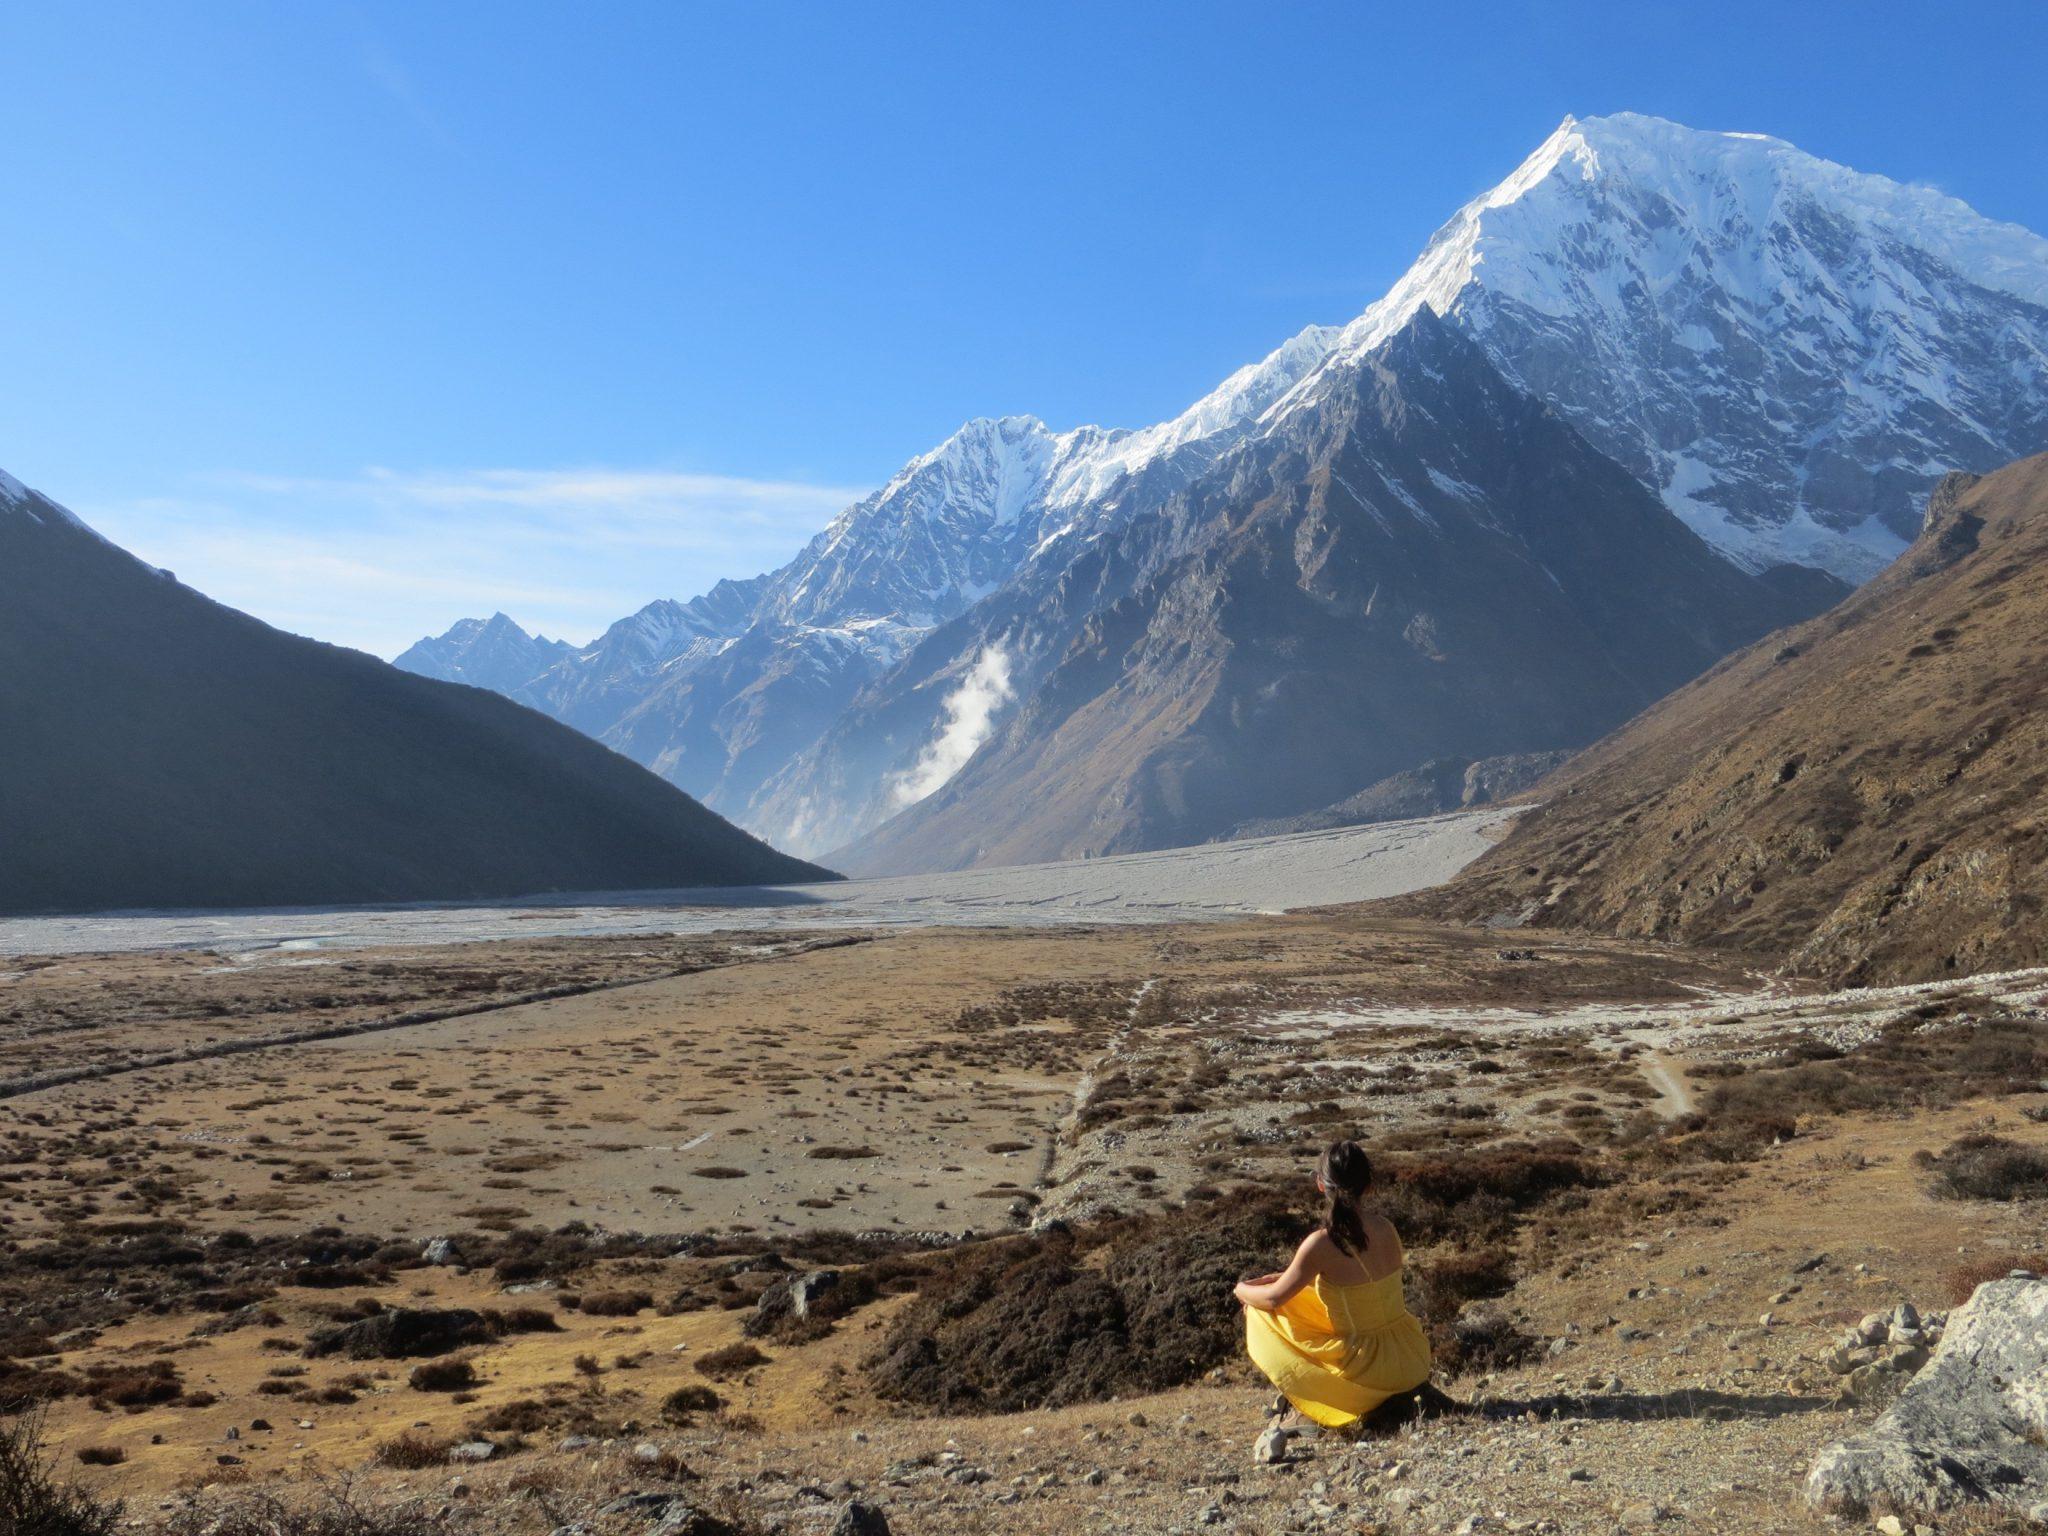 Sárga ruhás lány - Kianjin Gompa, Nepál